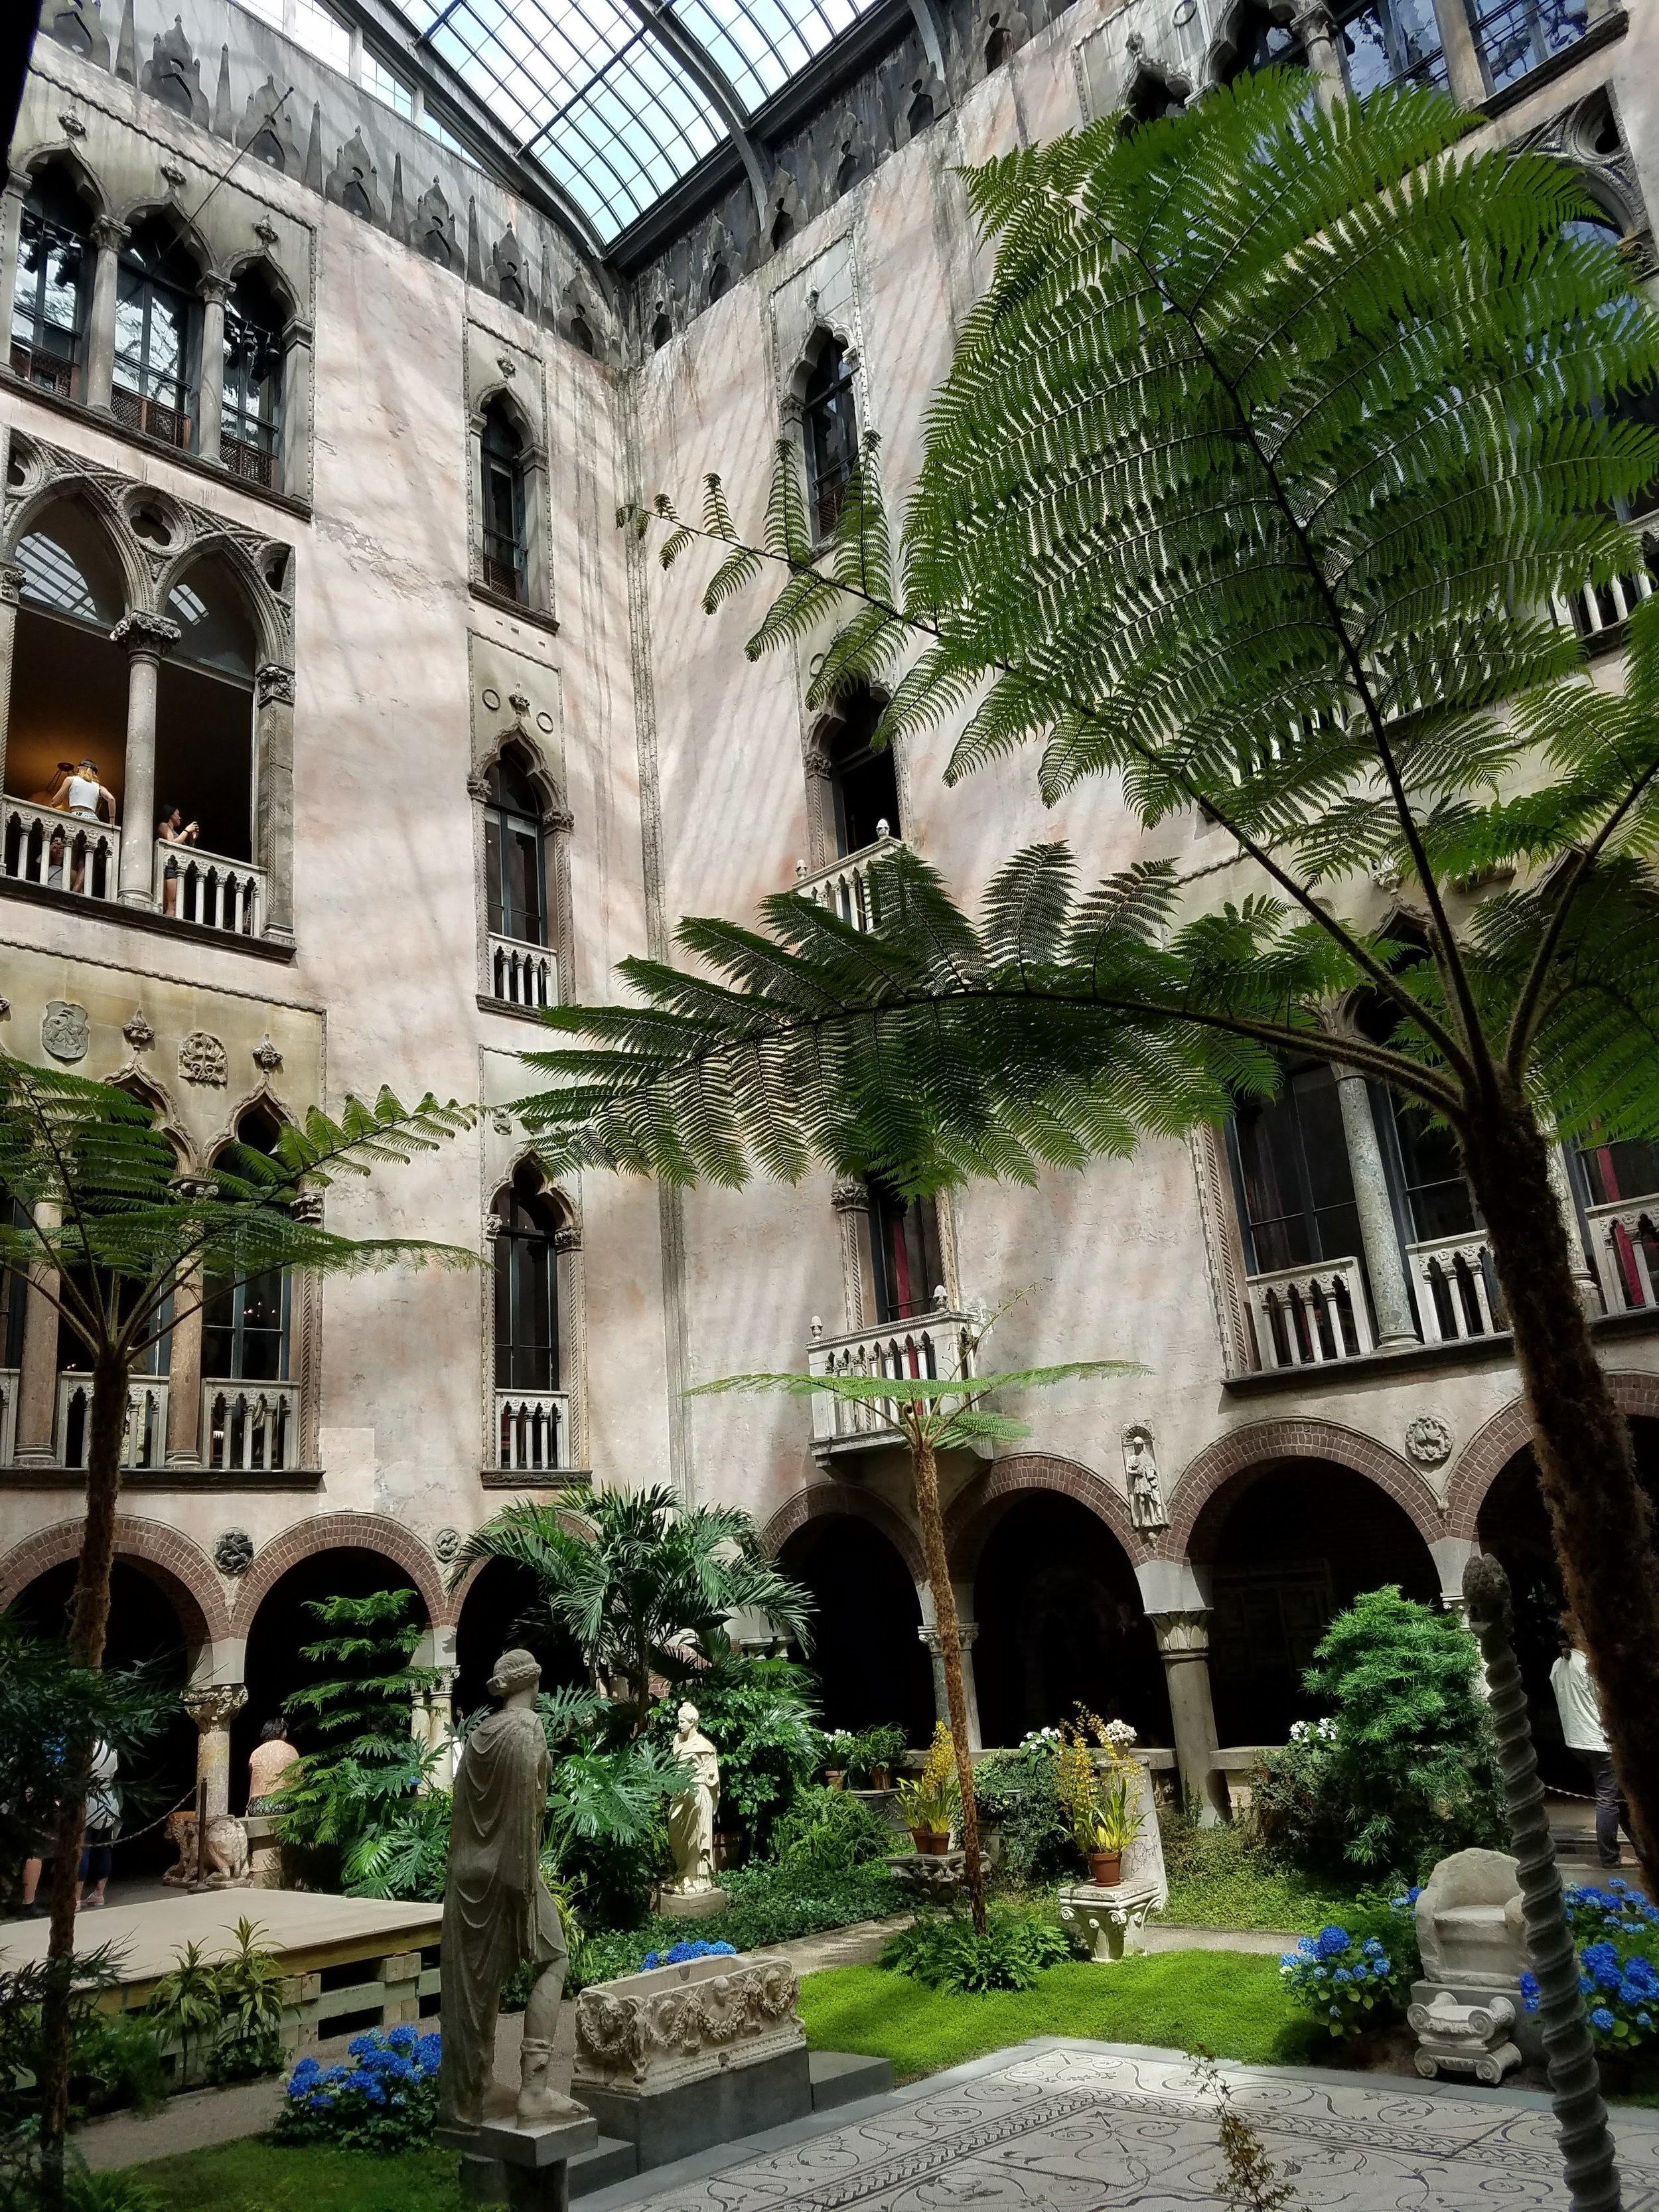 Courtyard in the Isabella Stewart Gardner Museum in Boston, MA.